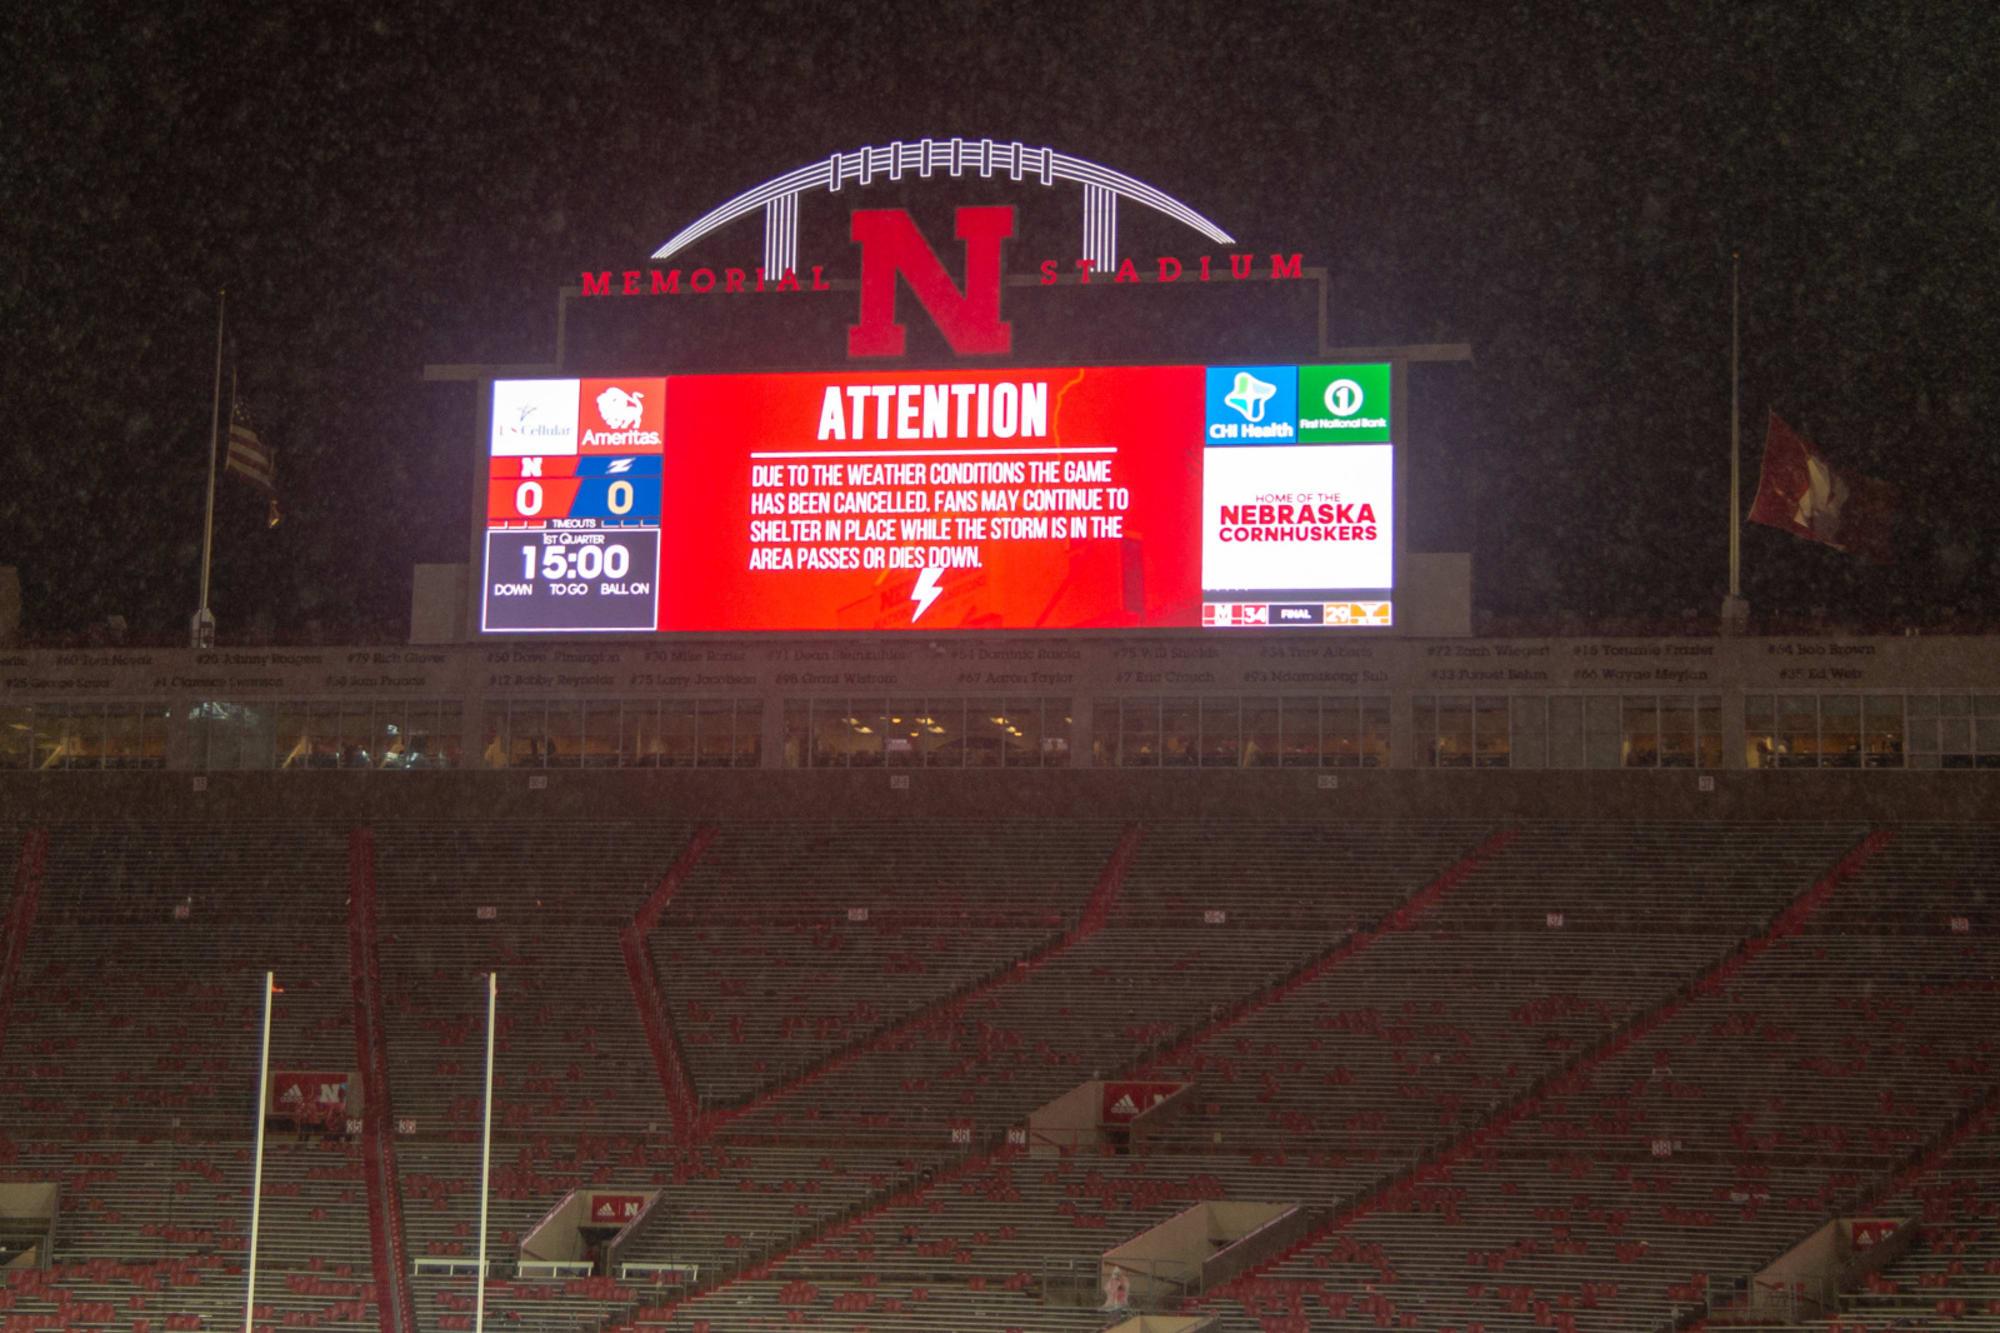 Nebraska football: 3 ways pandemic hurt the Huskers